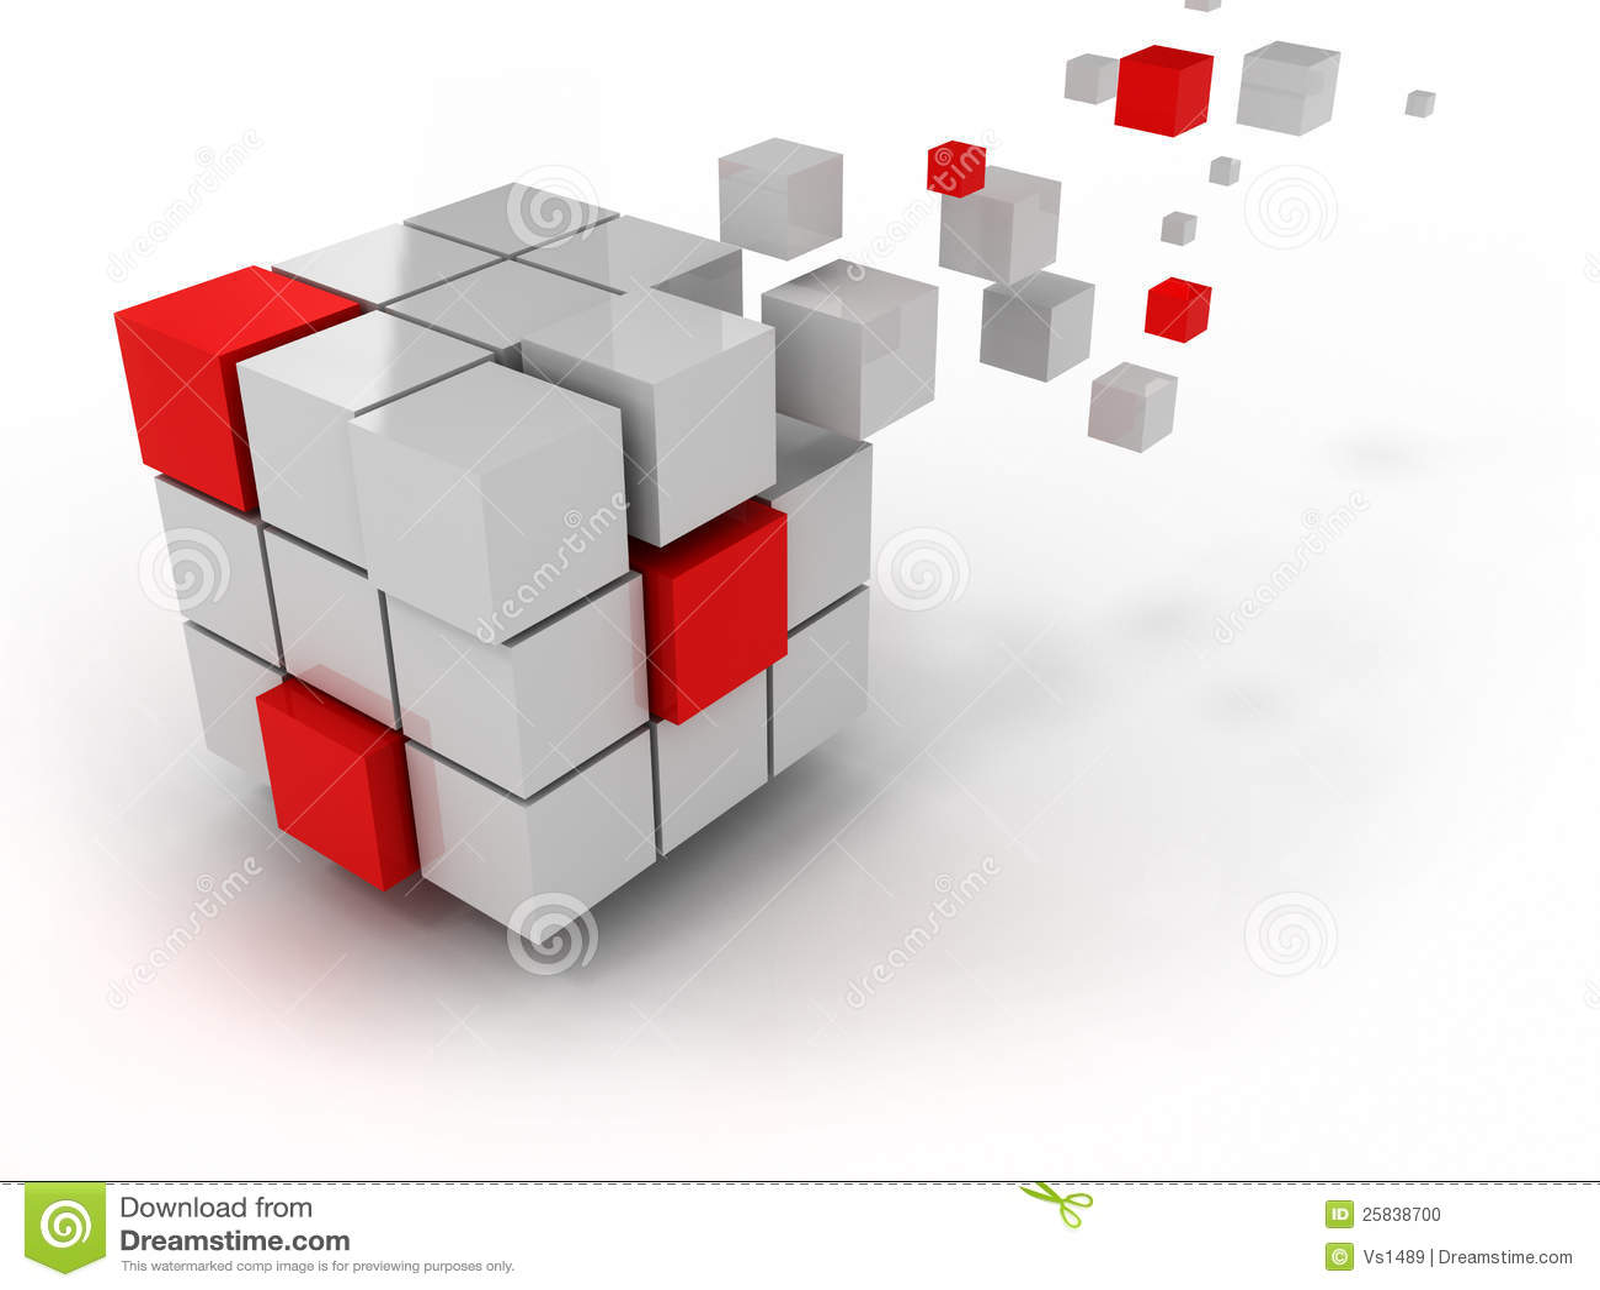 Design Build Business Structure